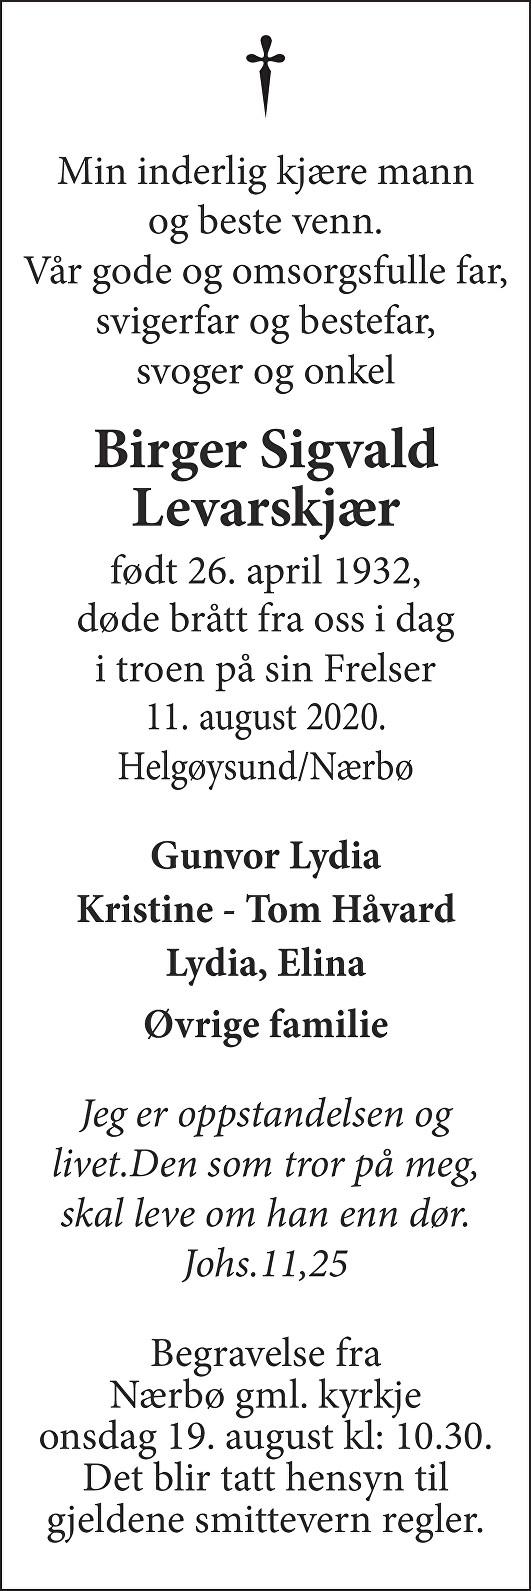 Birger Sigvald Levarskjær Dødsannonse